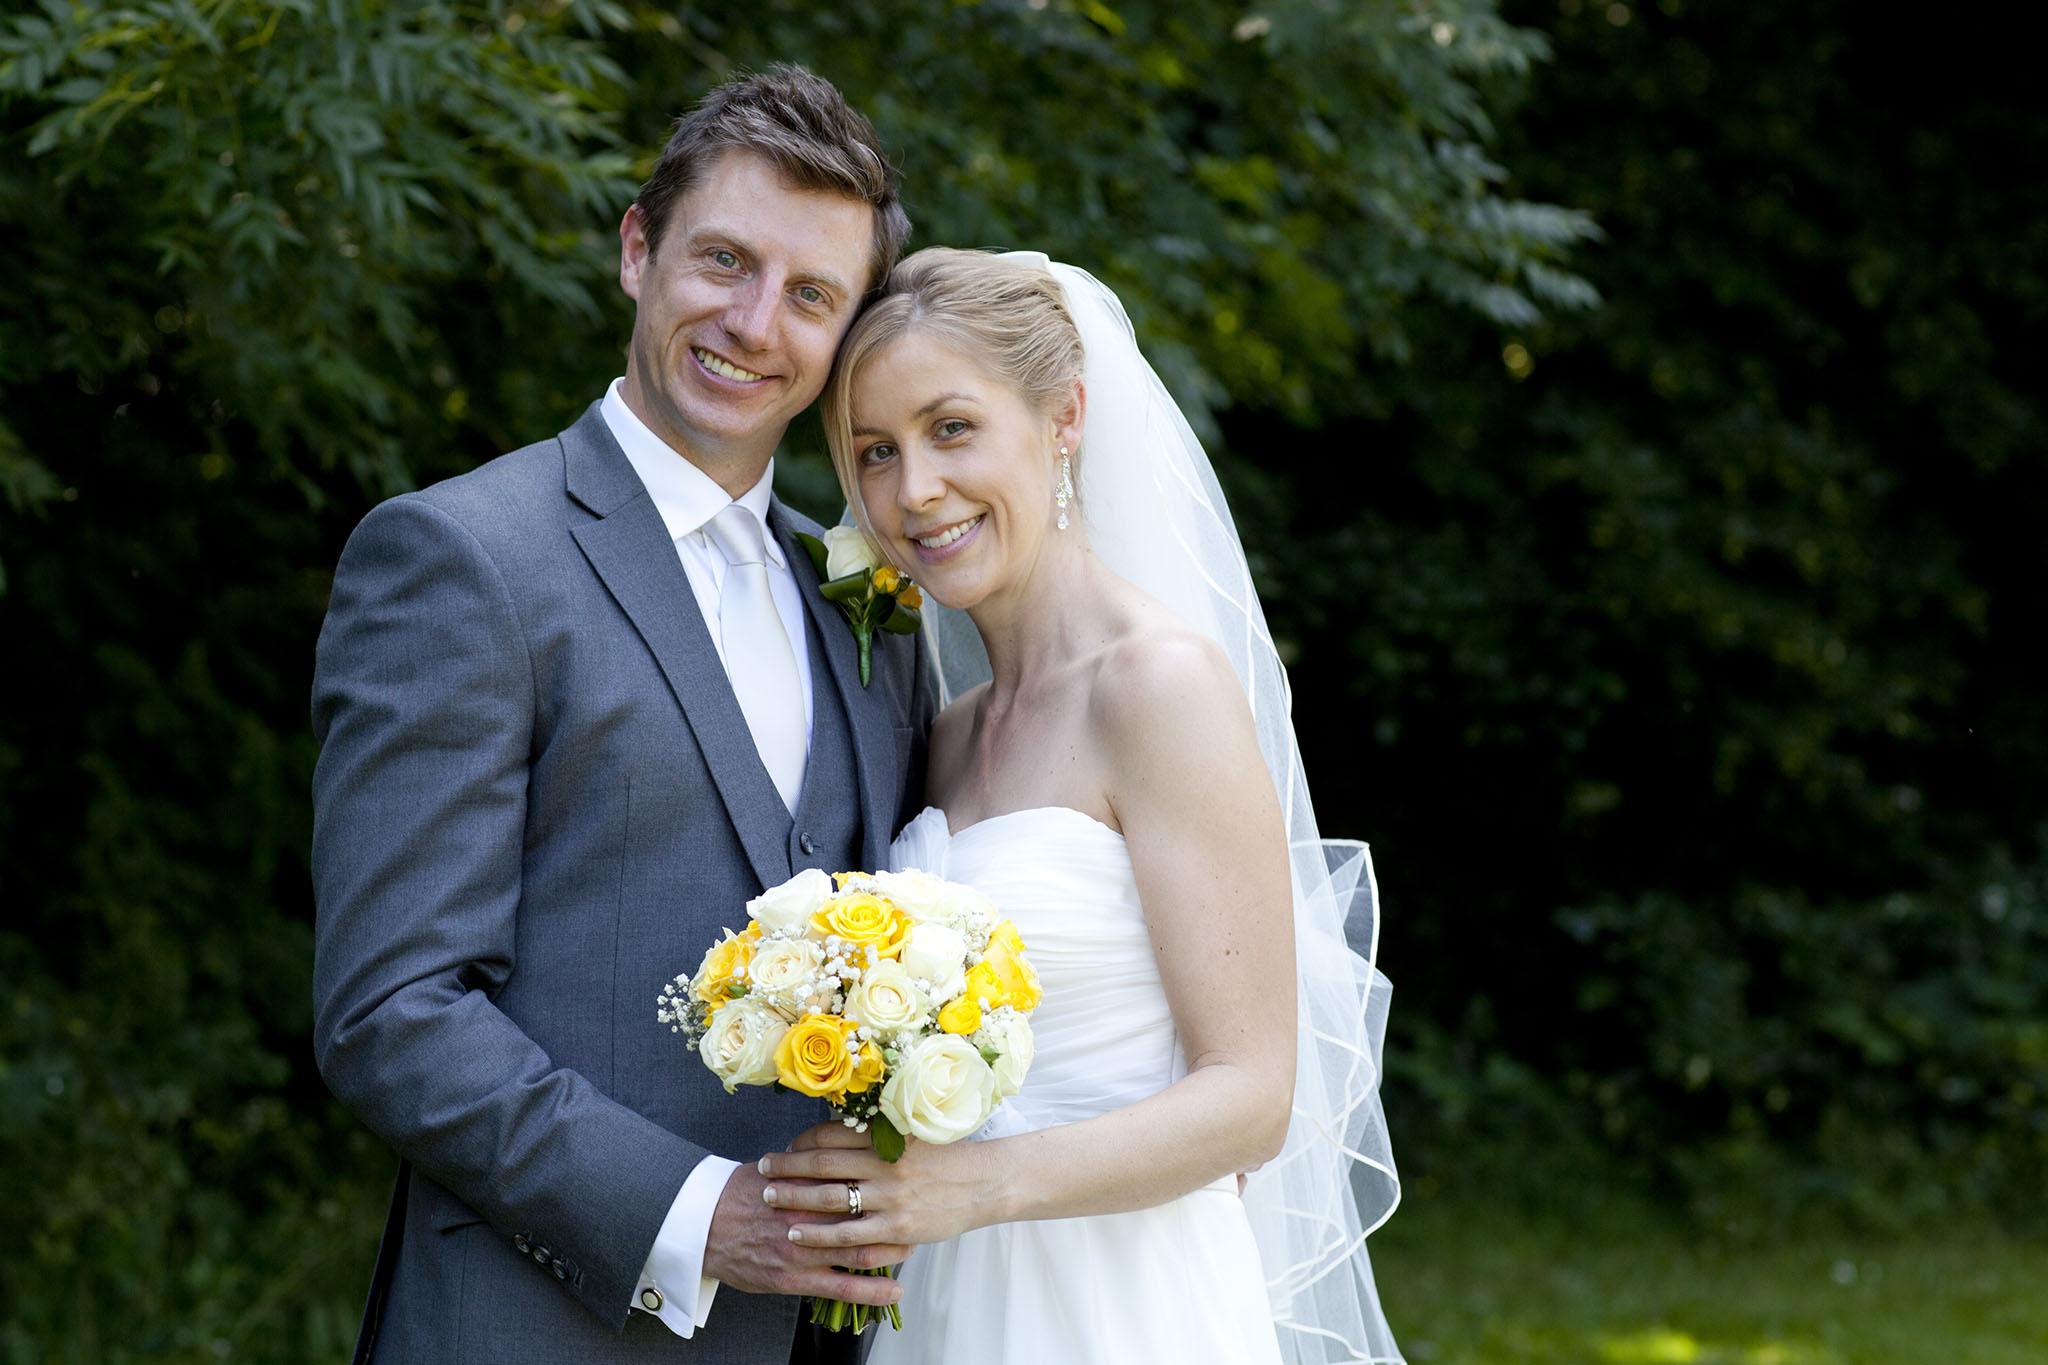 elizabethg_fineart_photography_hertfordshire_rachel_adam_wedding_highelmsmanor_32.jpg